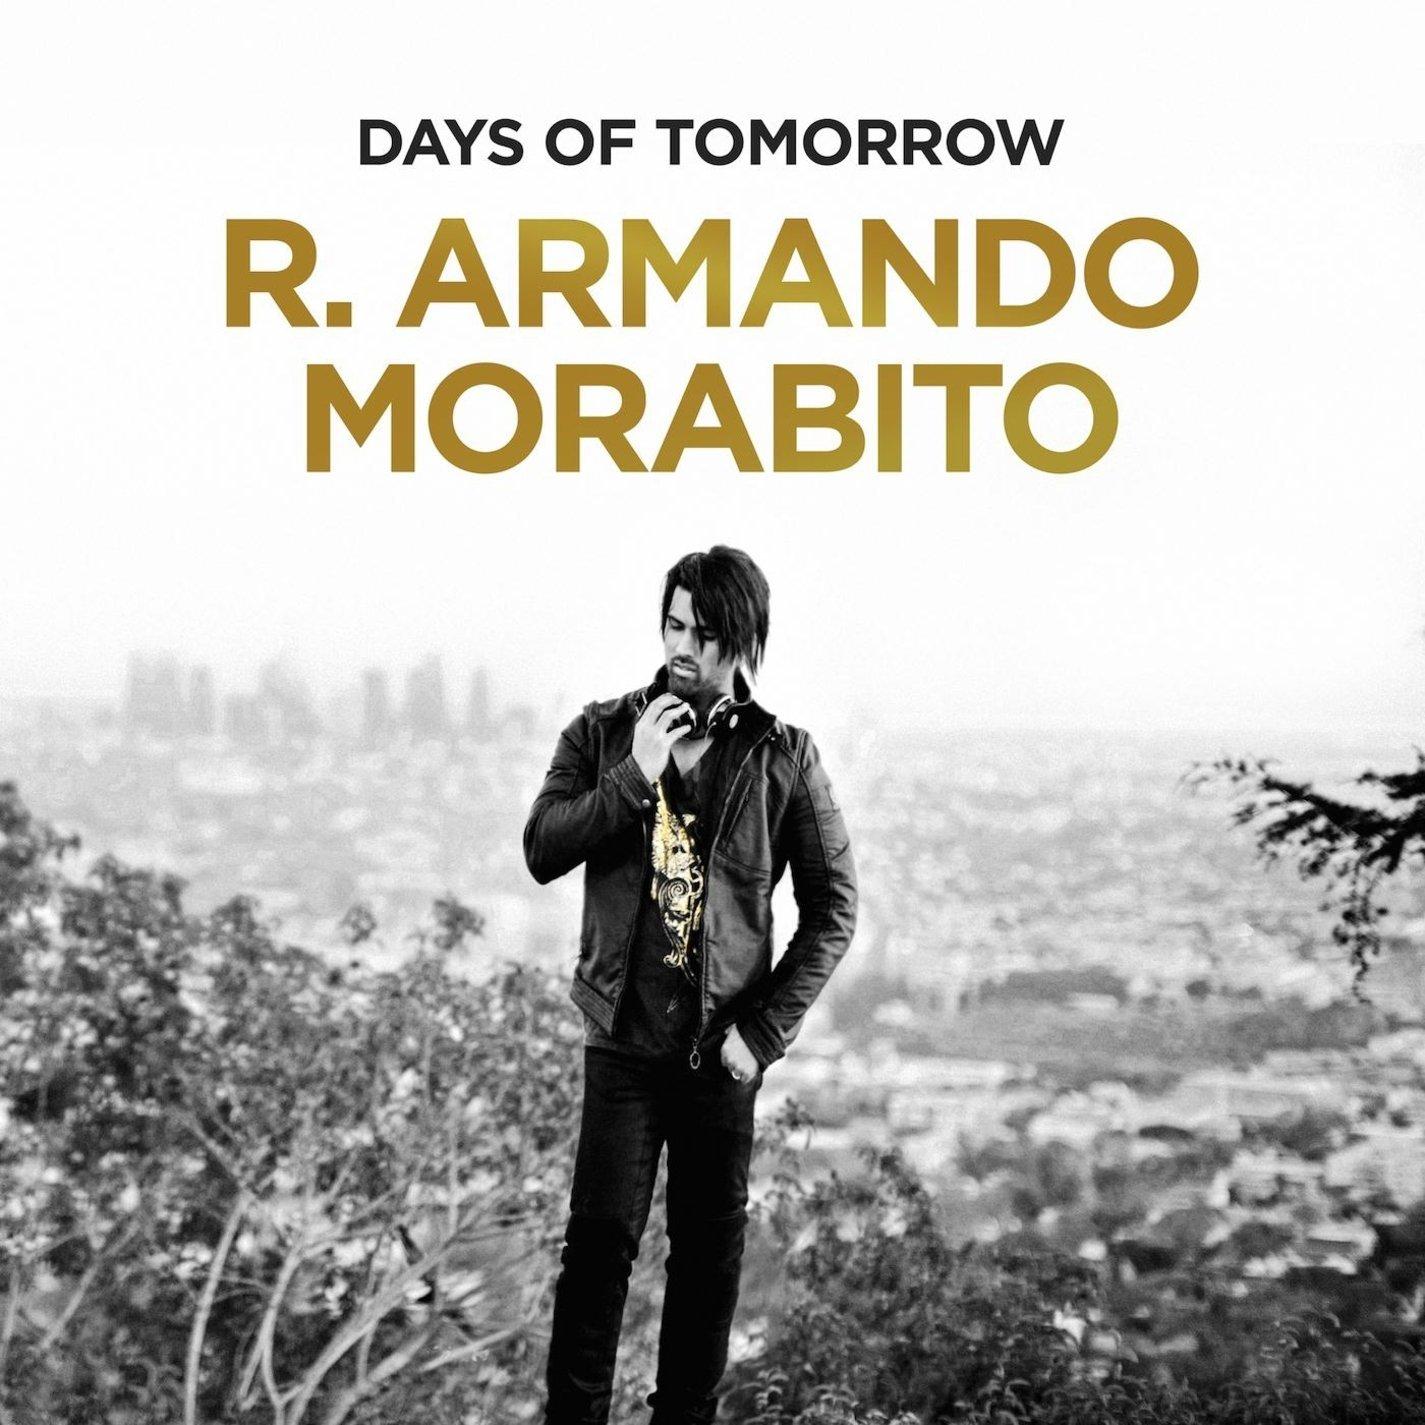 R. Armando Morabito - Days of Tomorrow